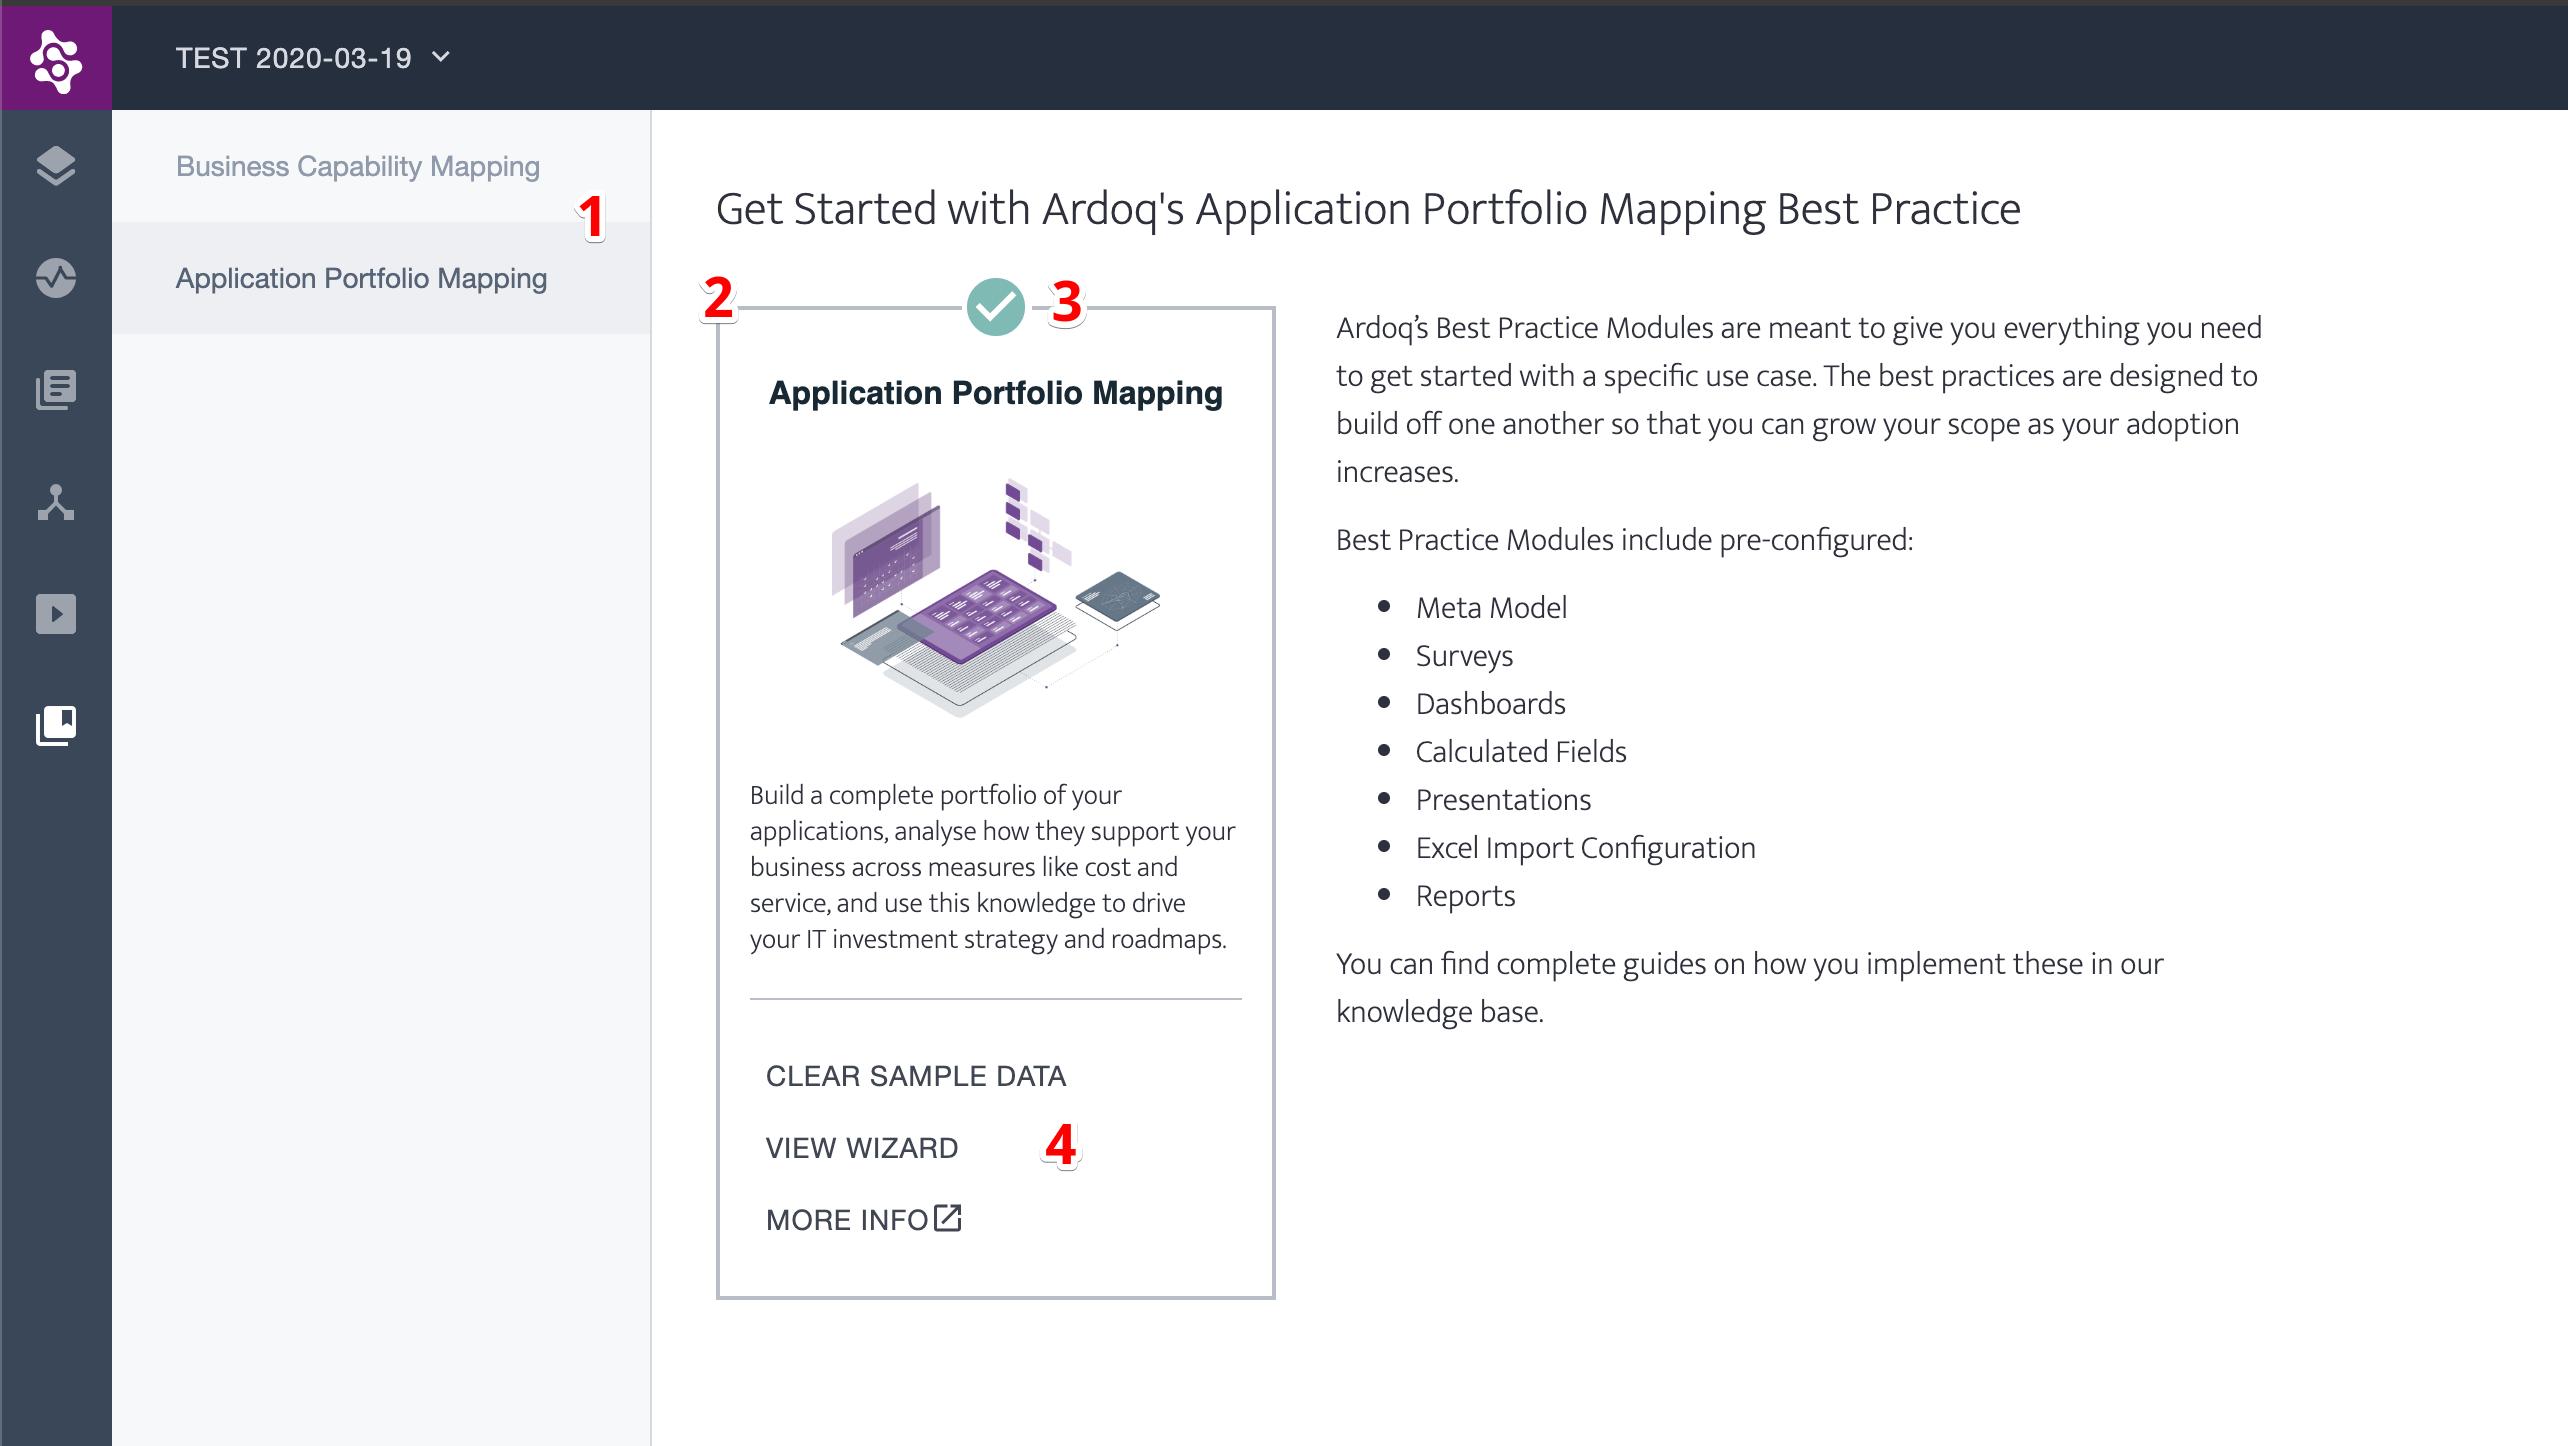 Ardoq available best practice modules